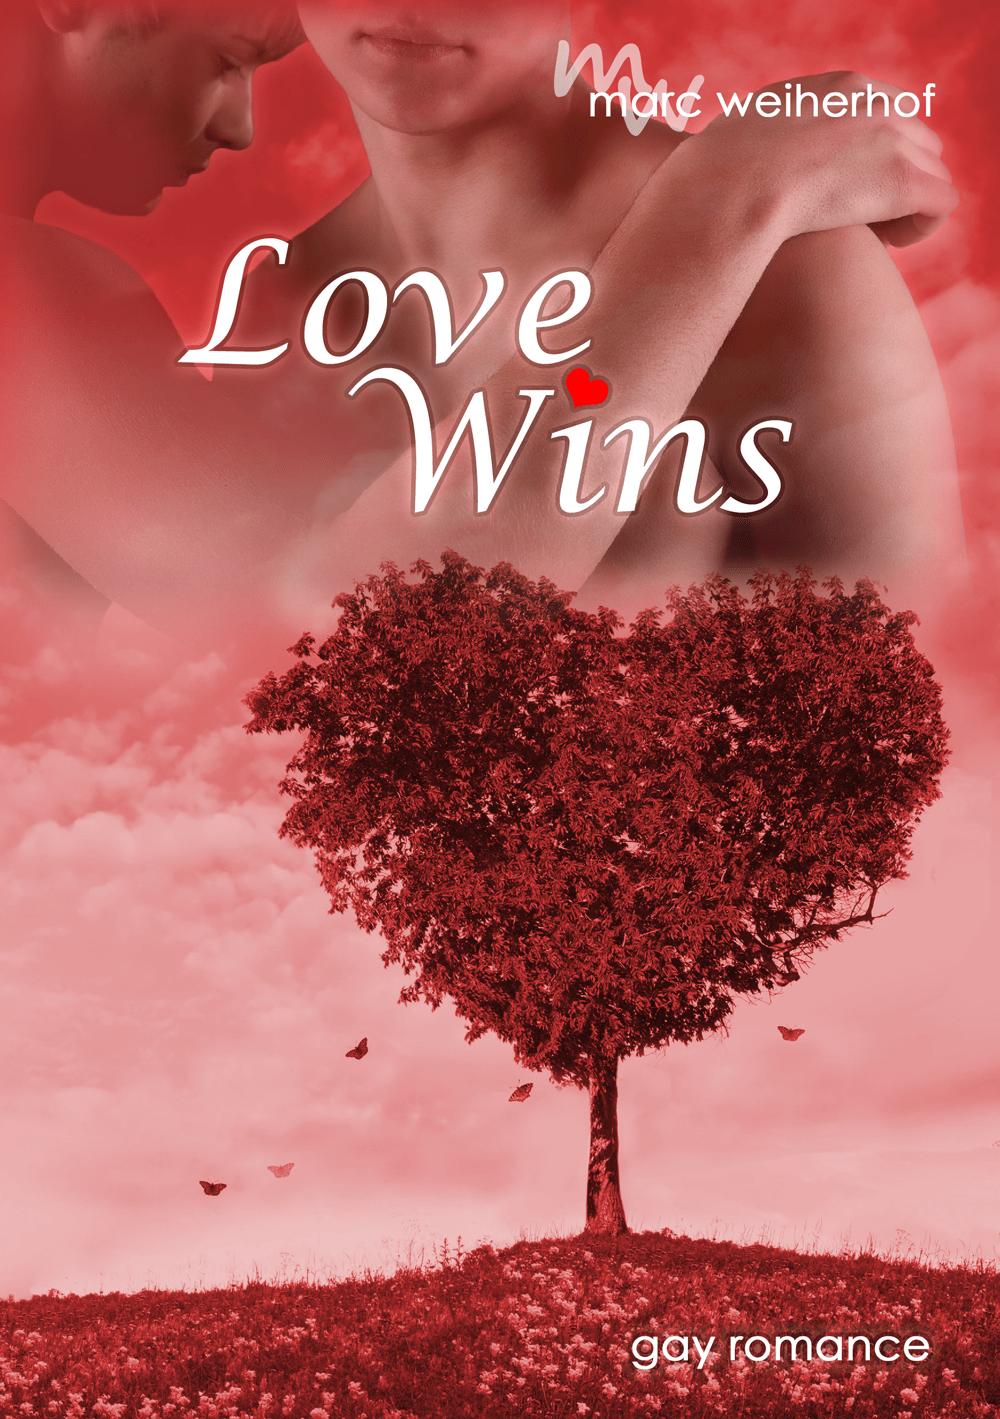 lovewins-gayromance-cover